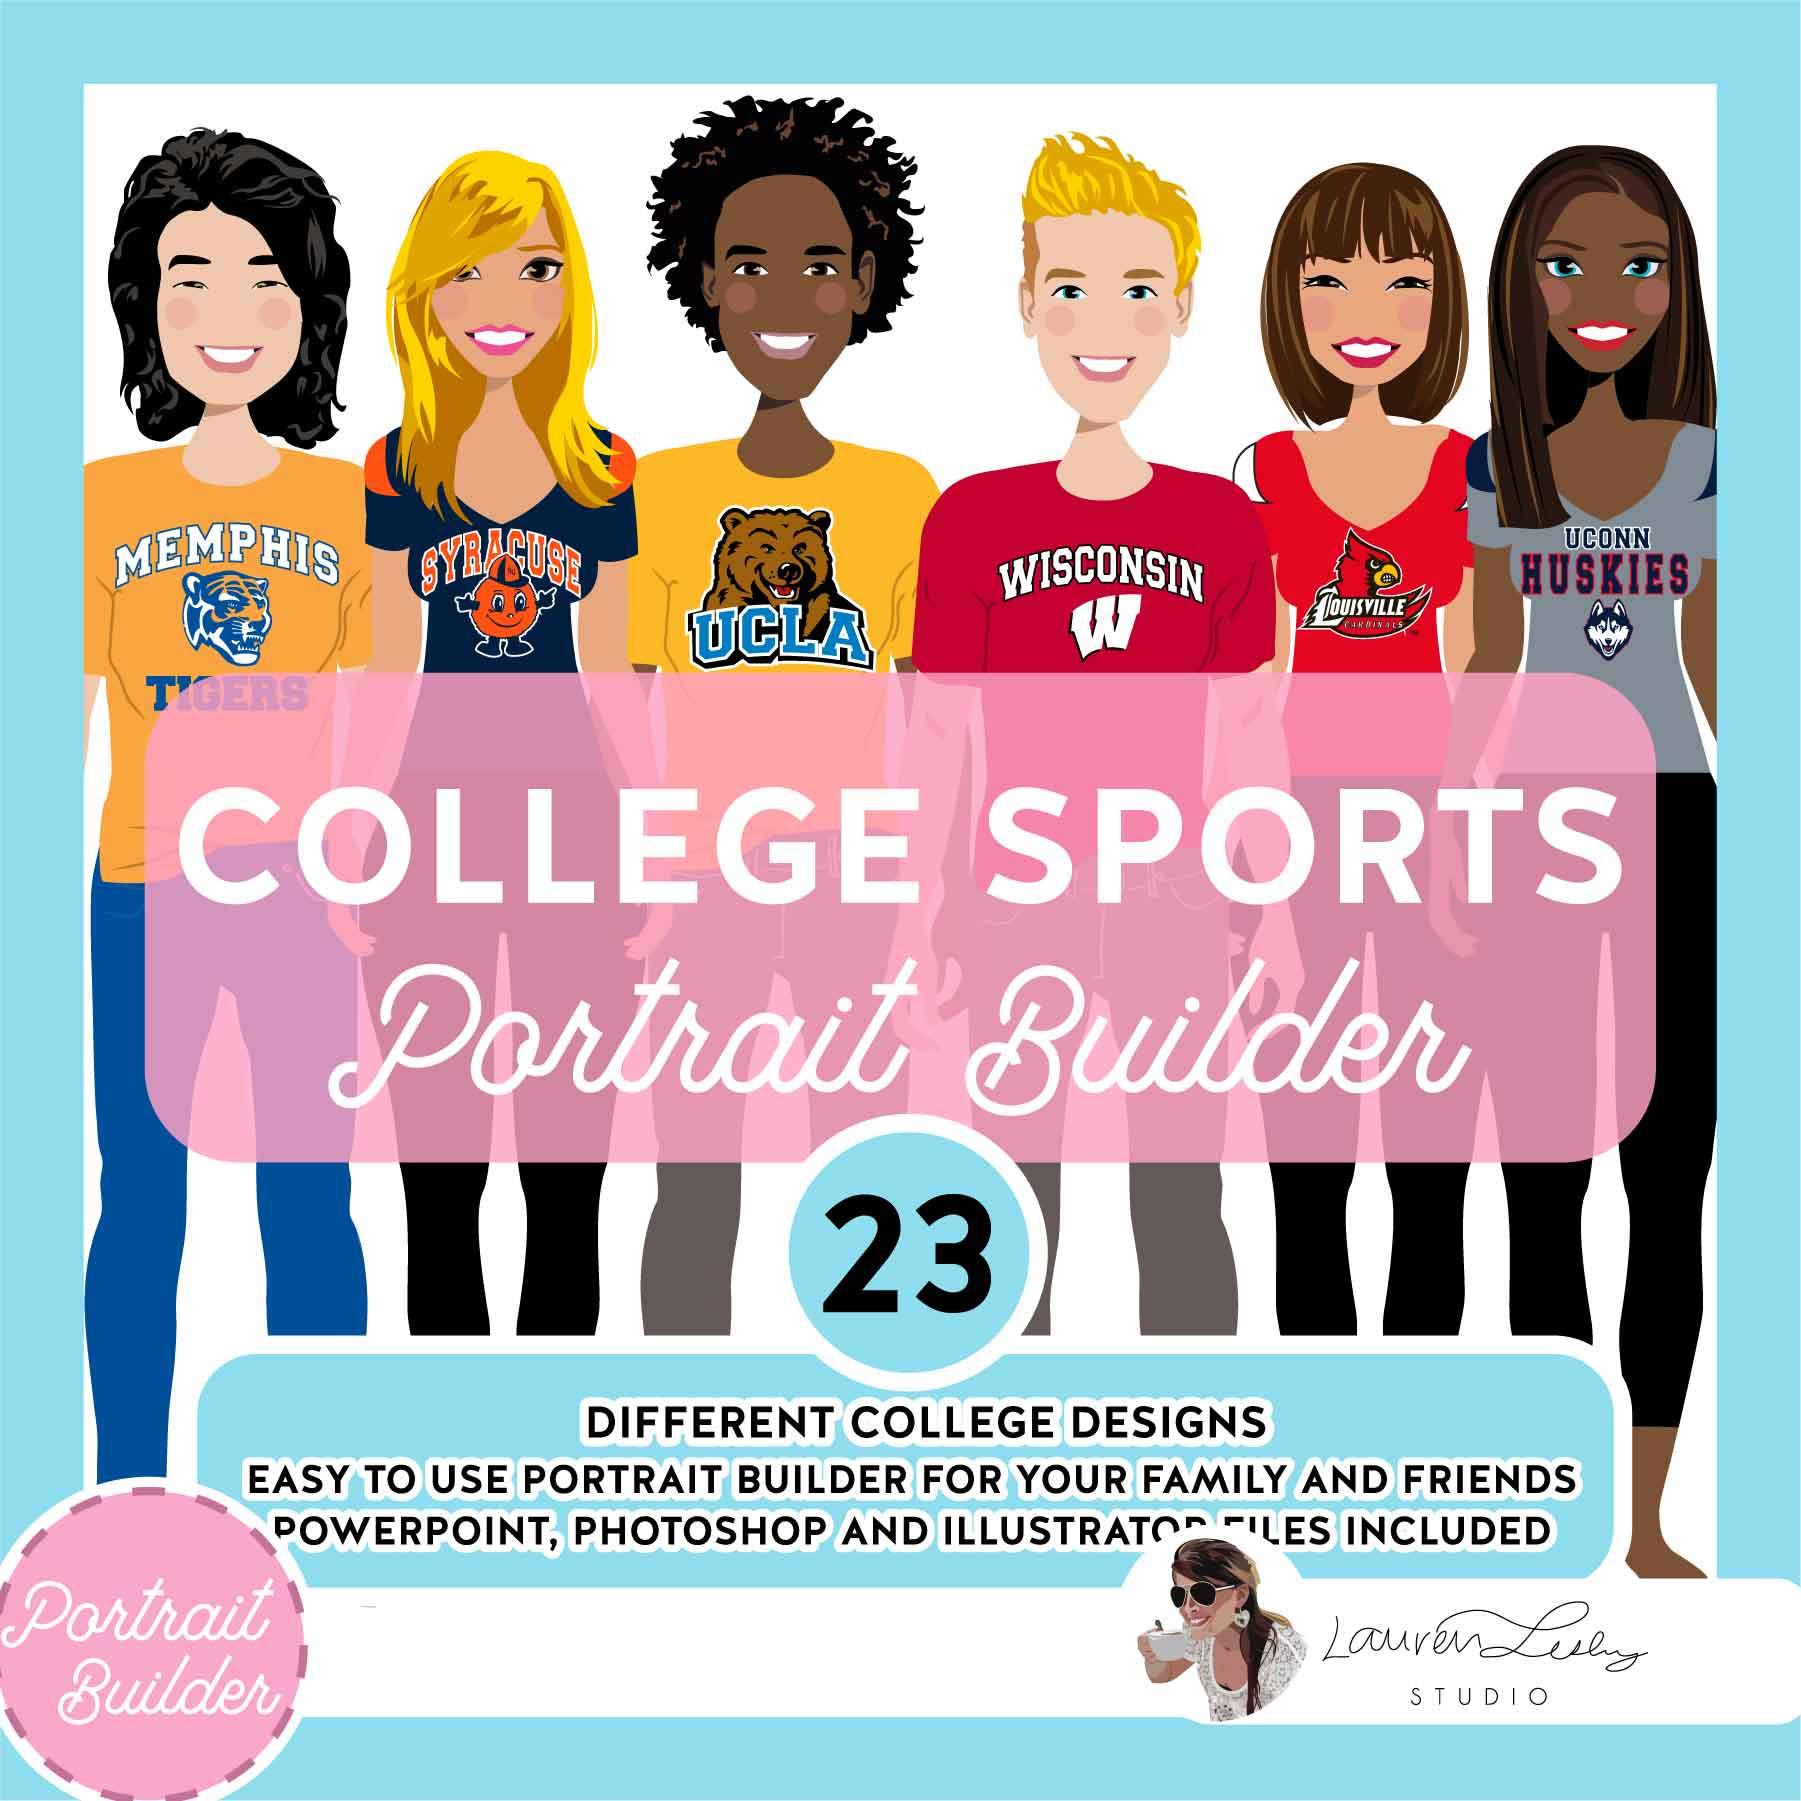 College Sports Portrait Builder